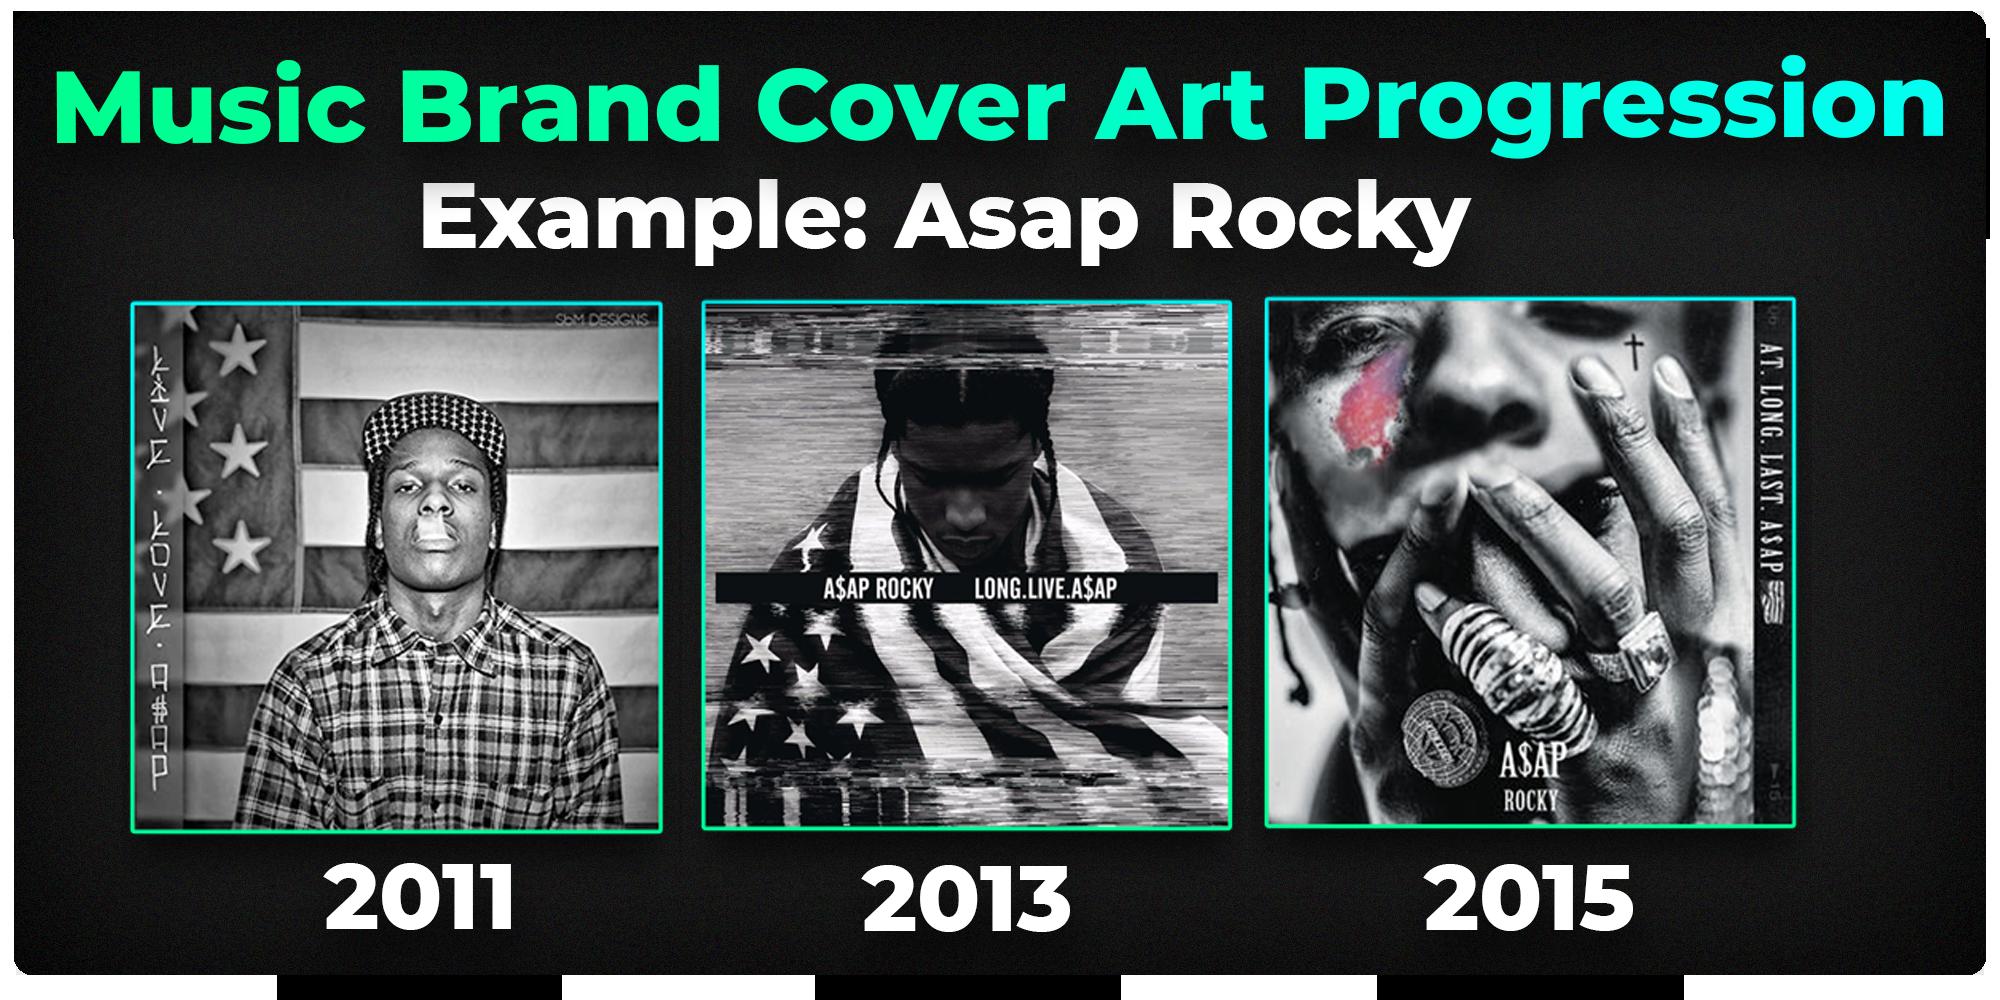 Asap Rcoky album progression